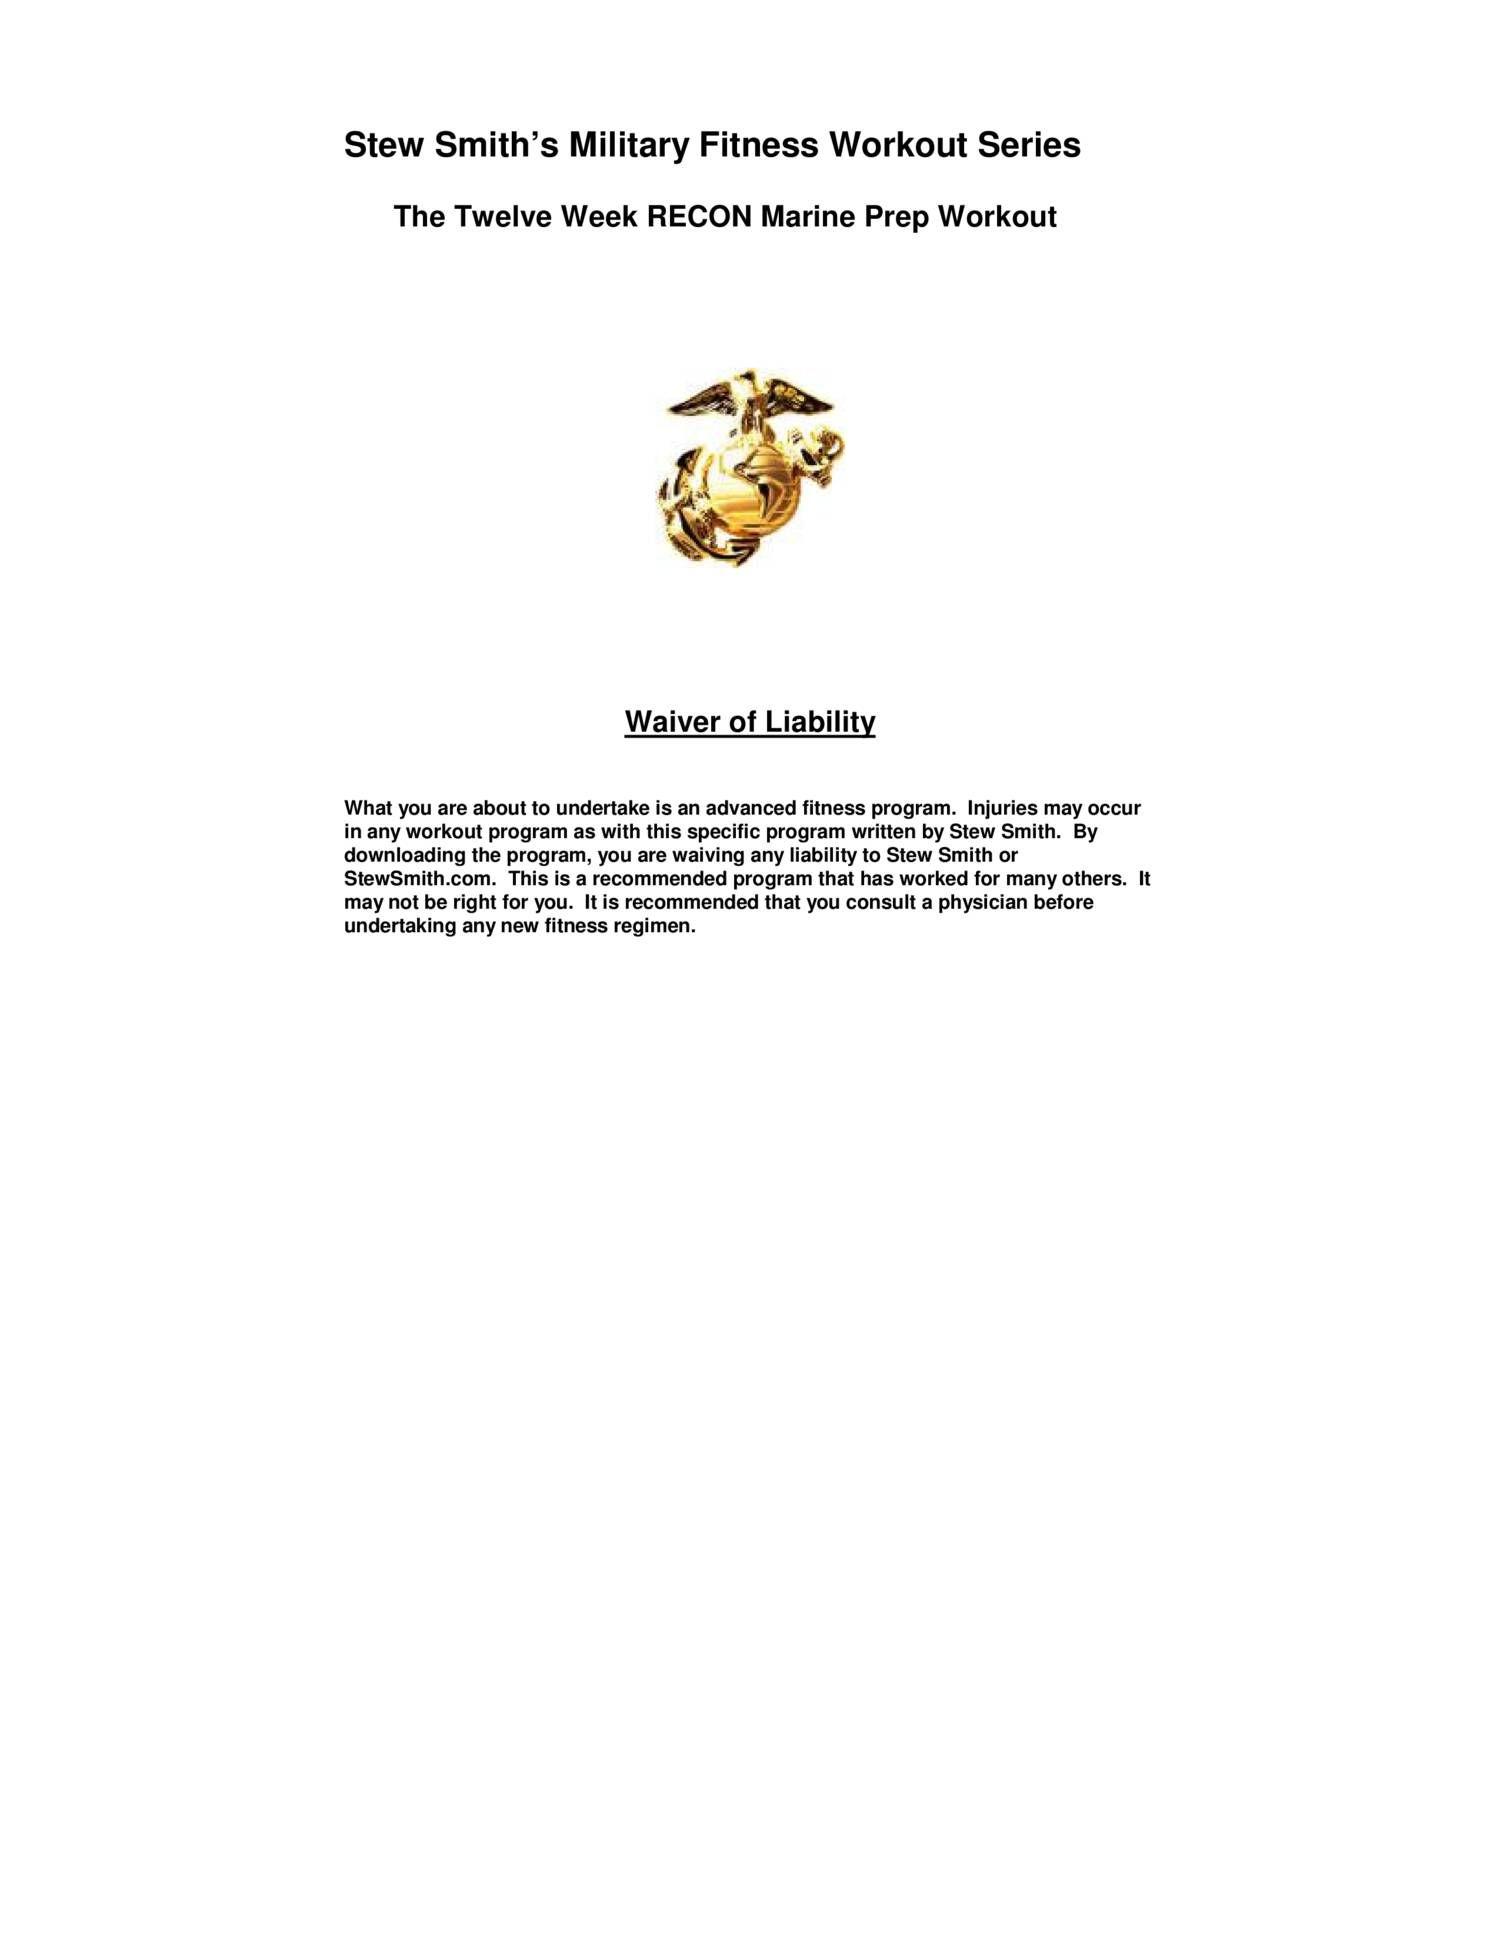 marine corps workout | Workouts | Pinterest | Workout, Military